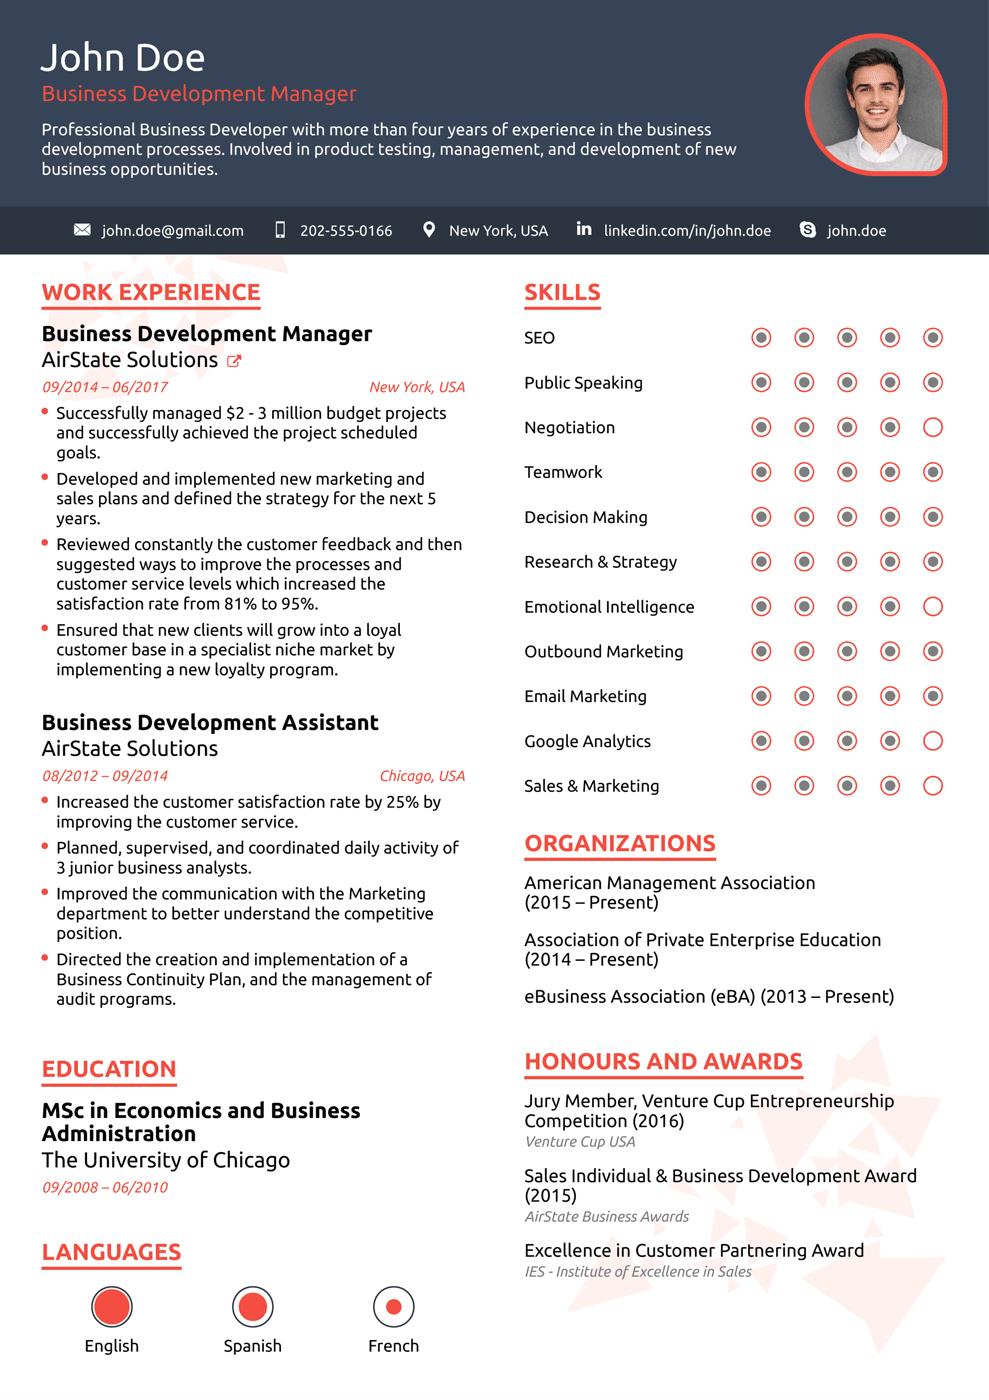 Resume Templates 2018 Resume Resumetemplates Templates Resumetemplates2018 One Page Resume Template Resume Template Professional Best Resume Template